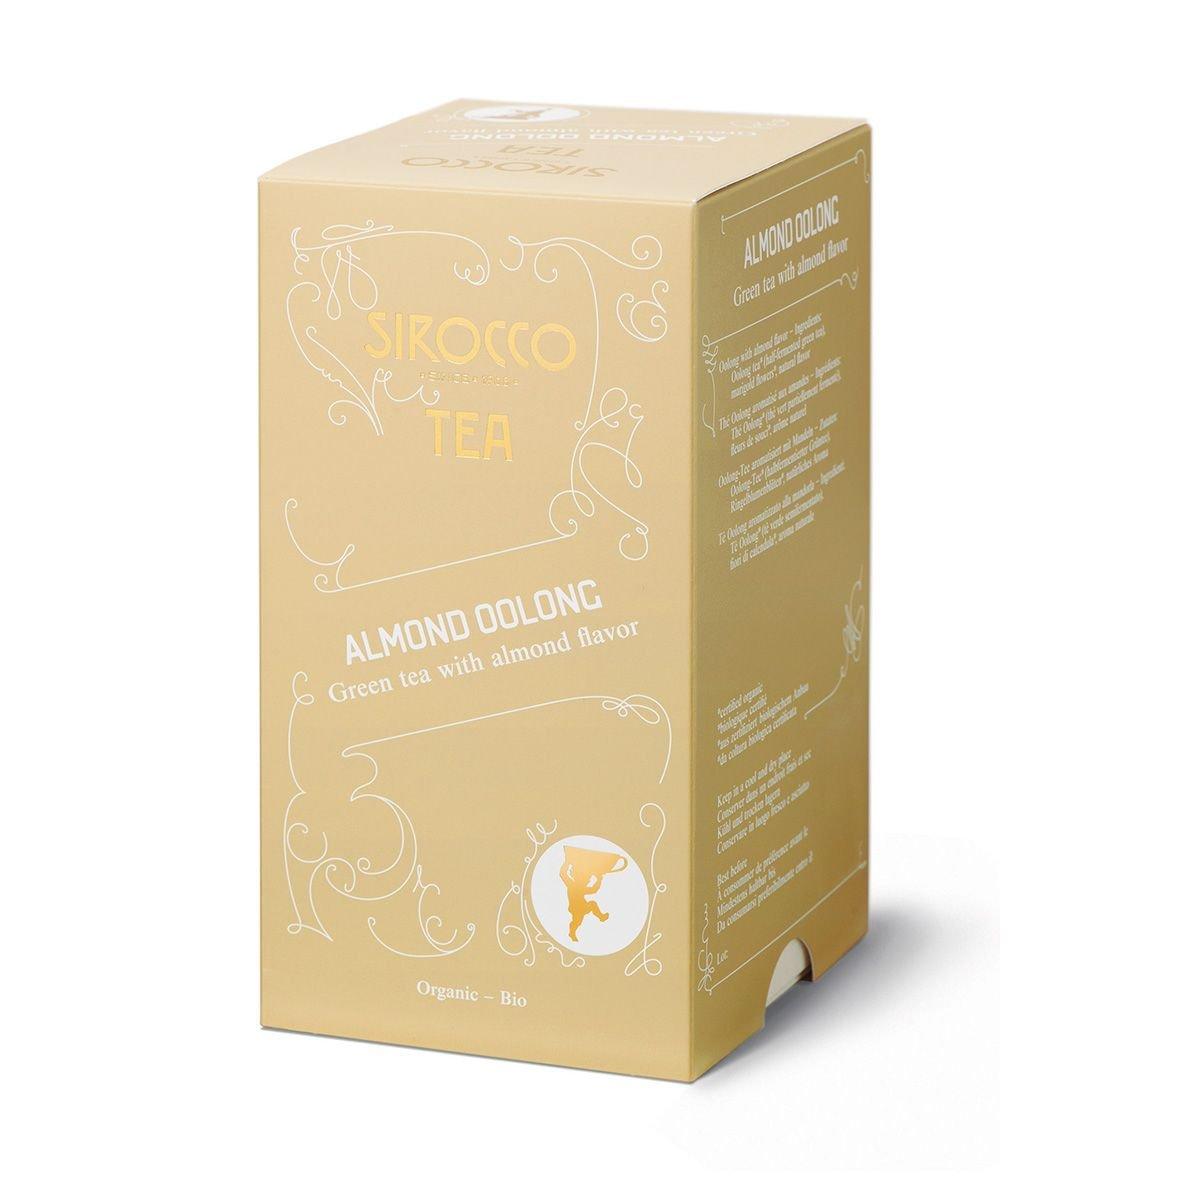 SIROCCO TEA Switzerland - ALMOND OOLONG - 3 x 20 tea bags (60 count) 61LIeVZtQbL